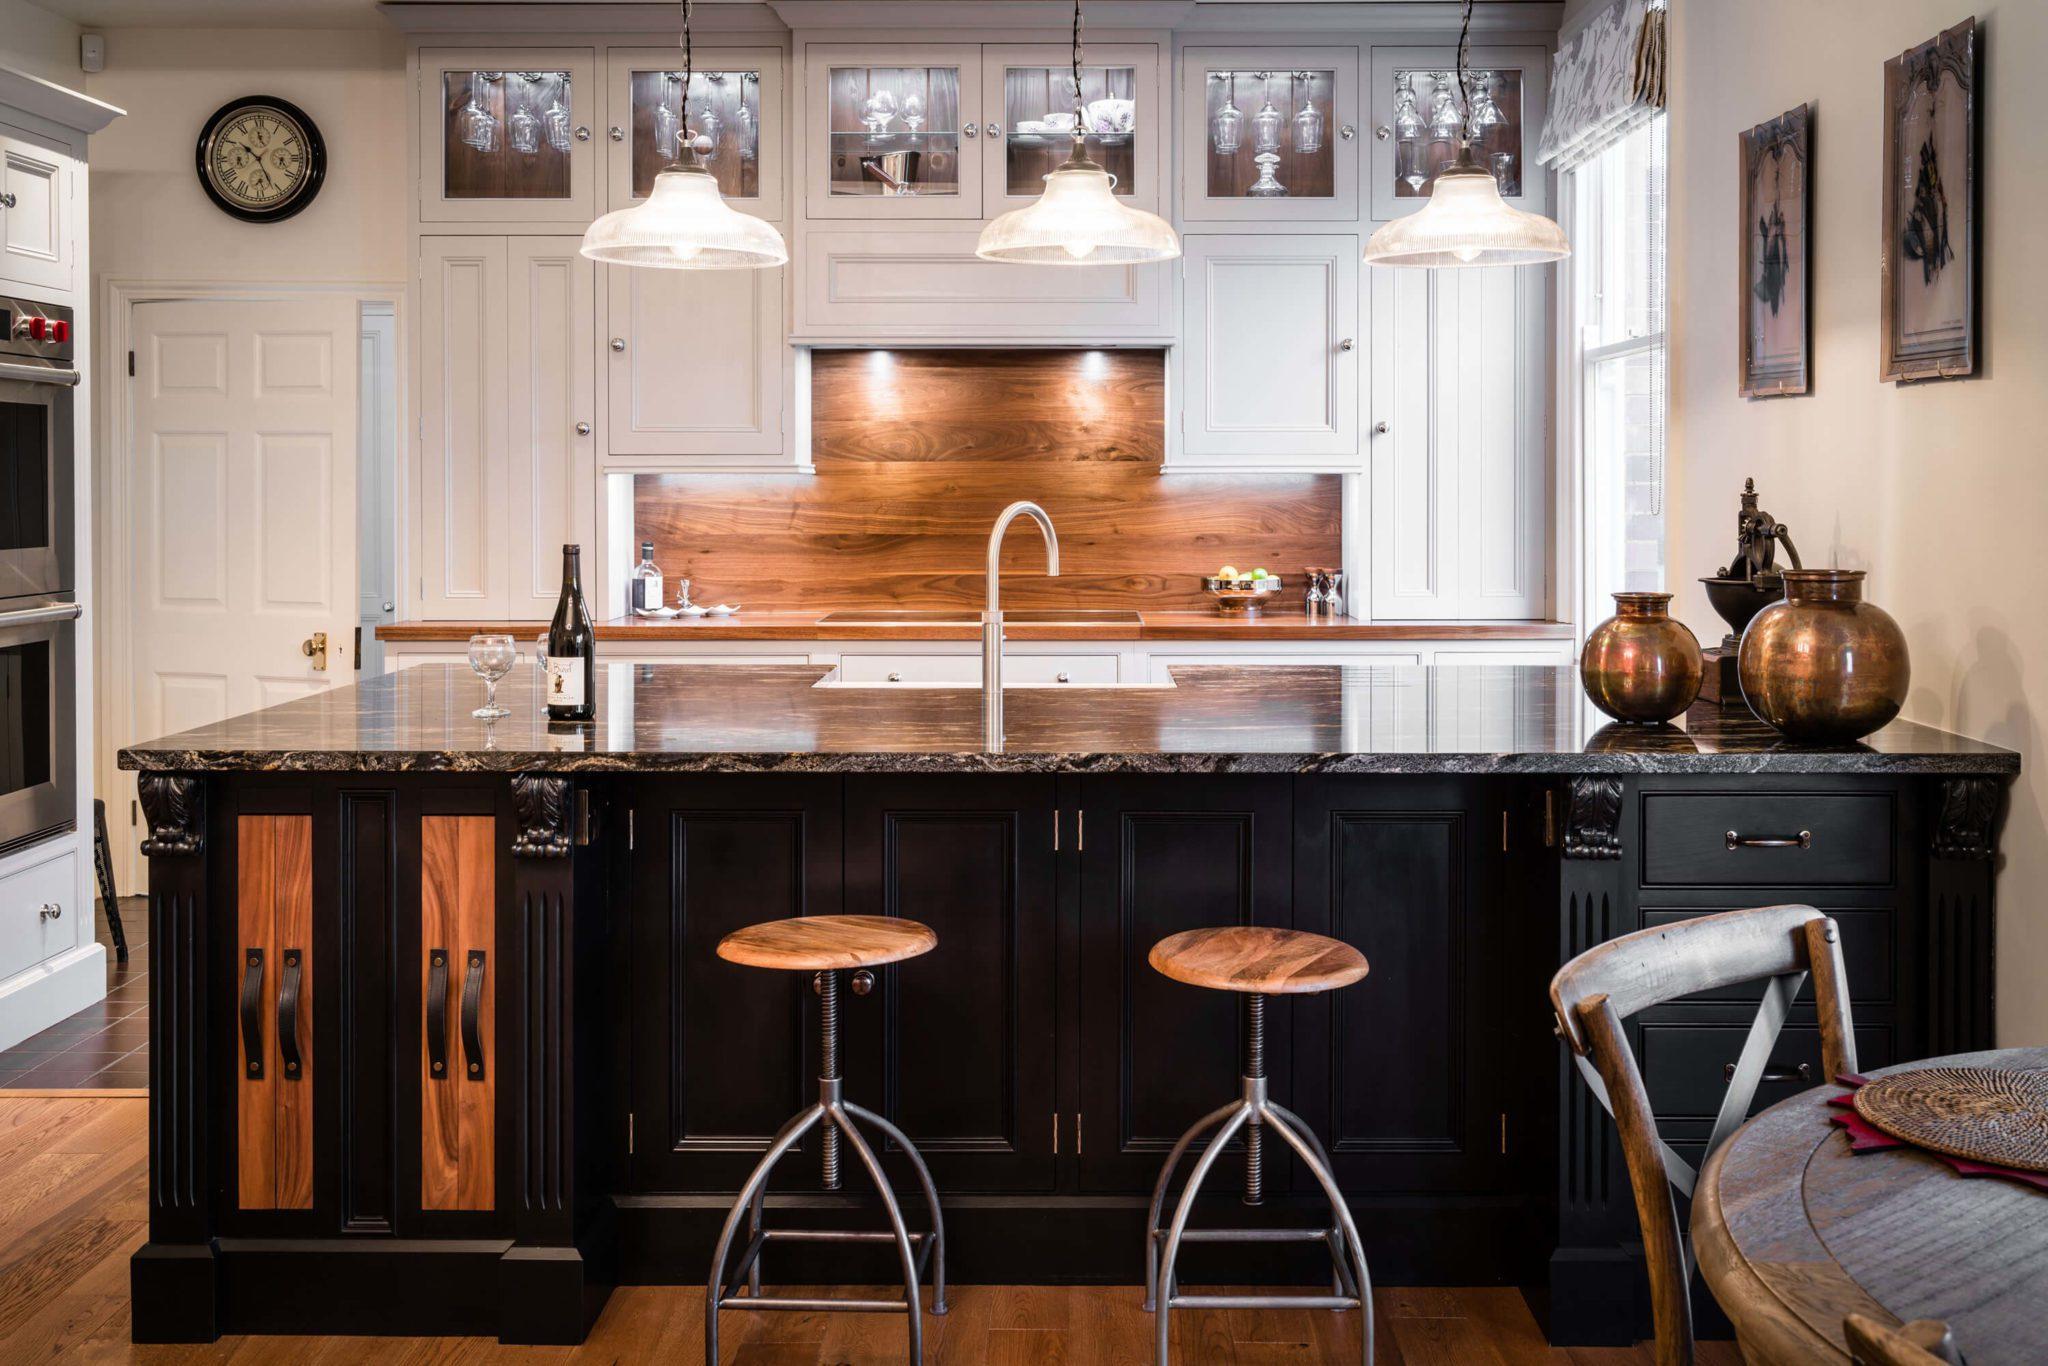 Kitchen Cabinet 13 - Hill Farm Furniture